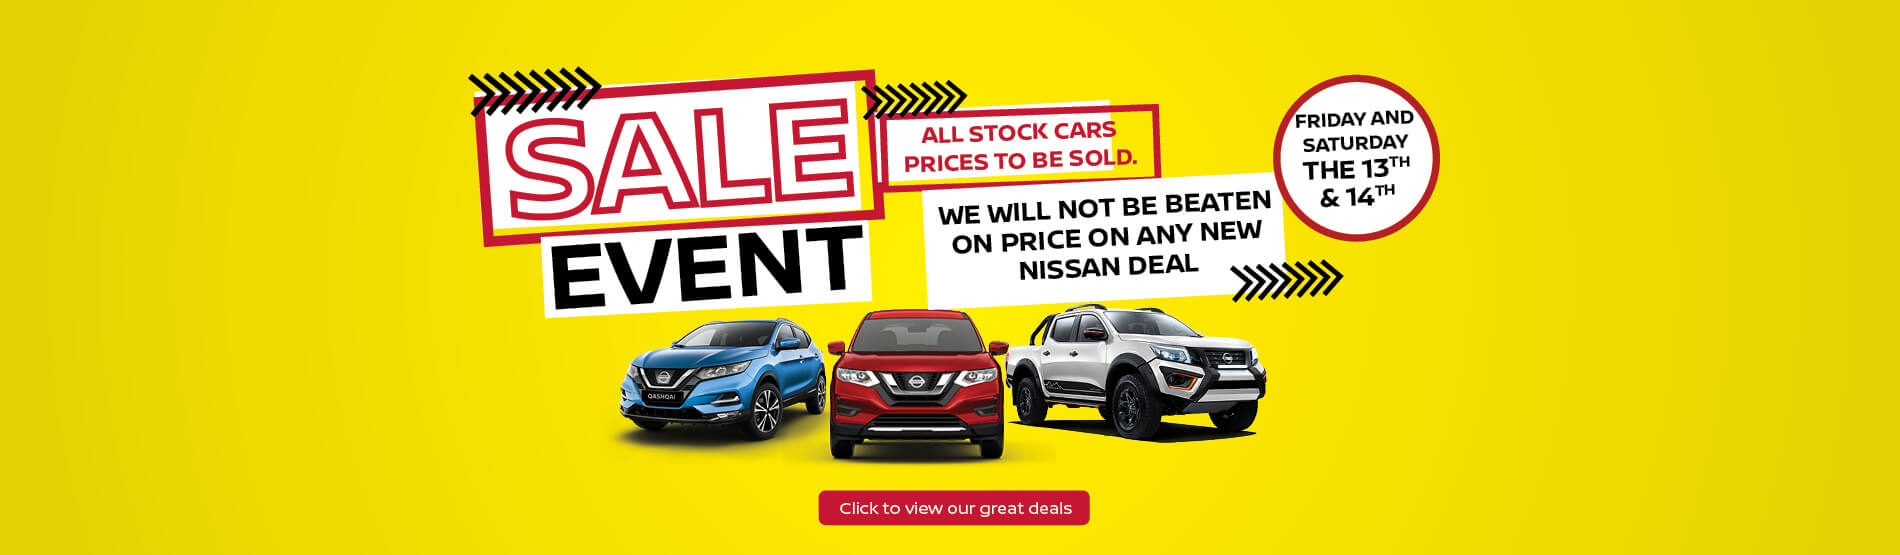 Ringwood Nissan Sale Event